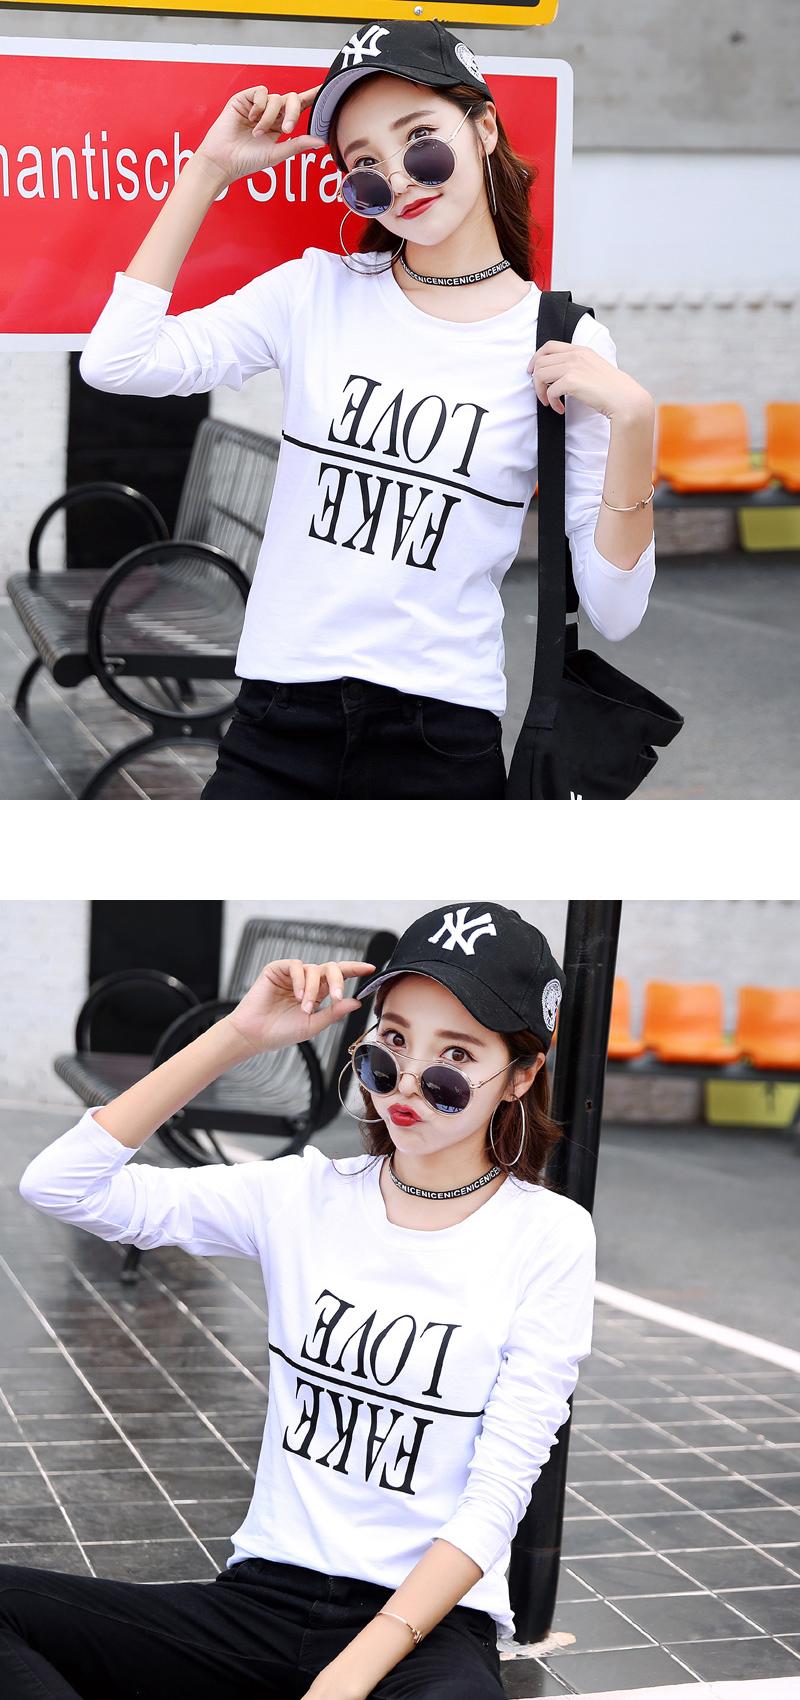 T恤 純棉長T 情侶裝 班服 MIT台灣製 可客製化 艾咪E舖